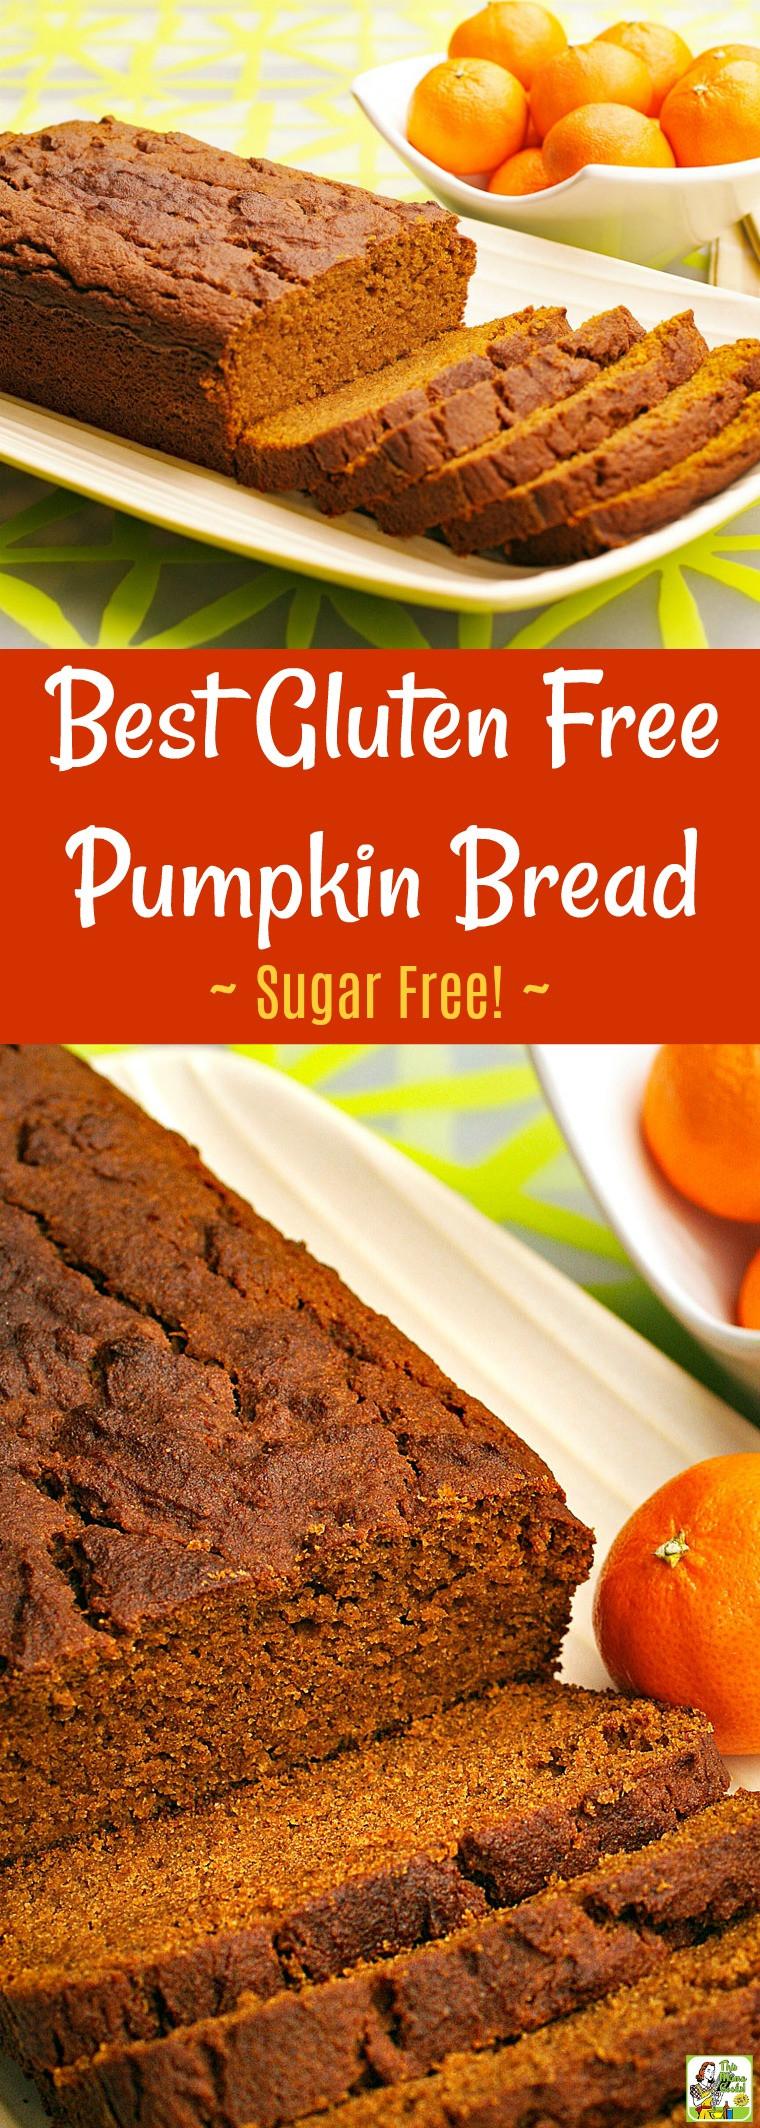 Dairy Free Pumpkin Bread  This Best Gluten Free Pumpkin Bread recipe is sugar free